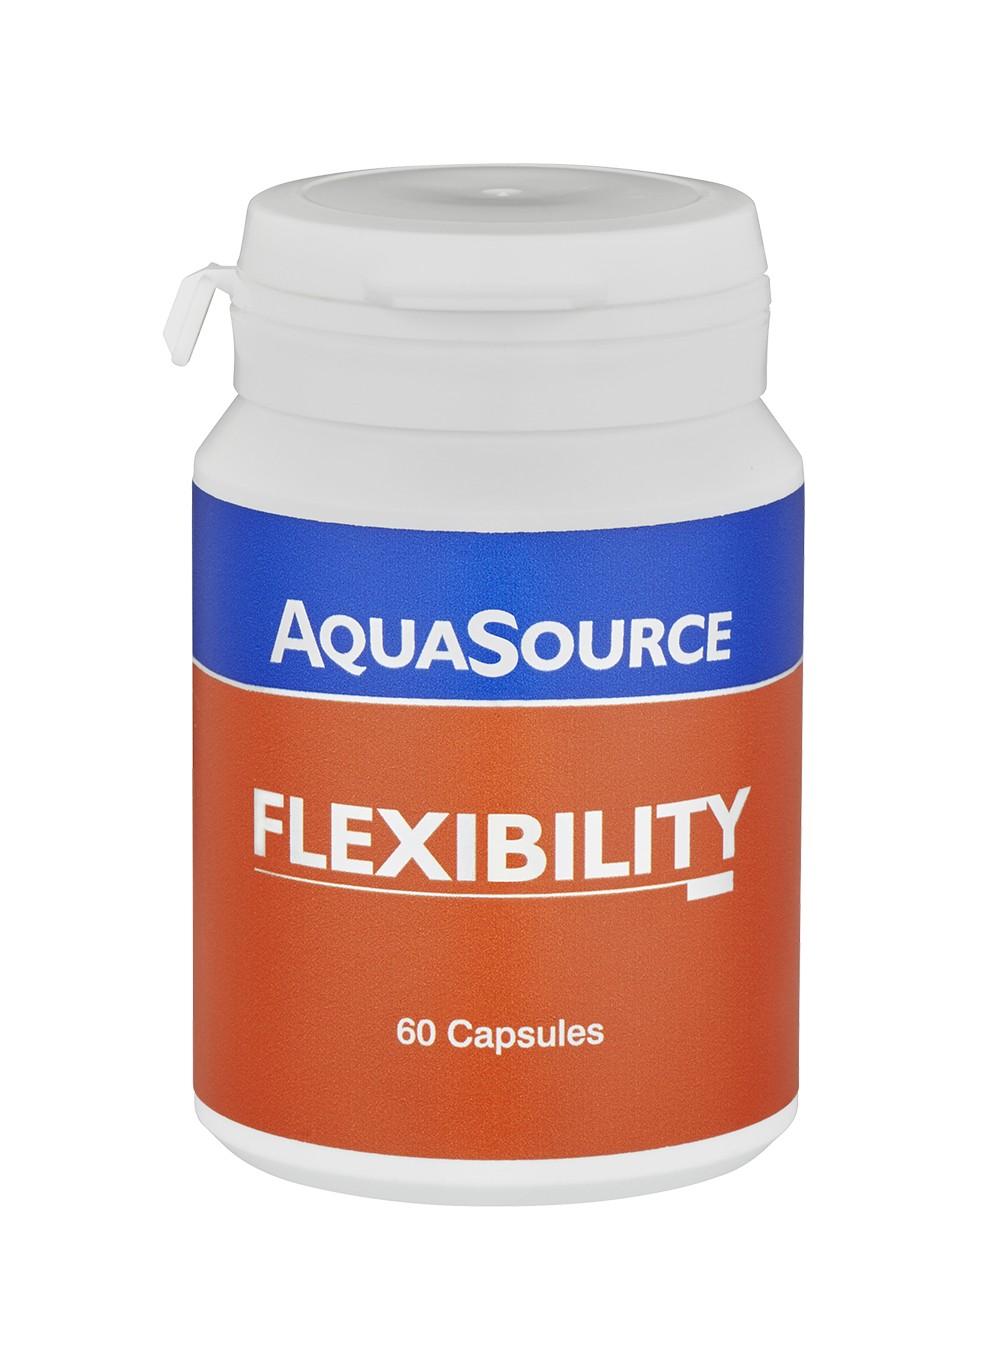 Флексибилити - гъвкавост и подвижност